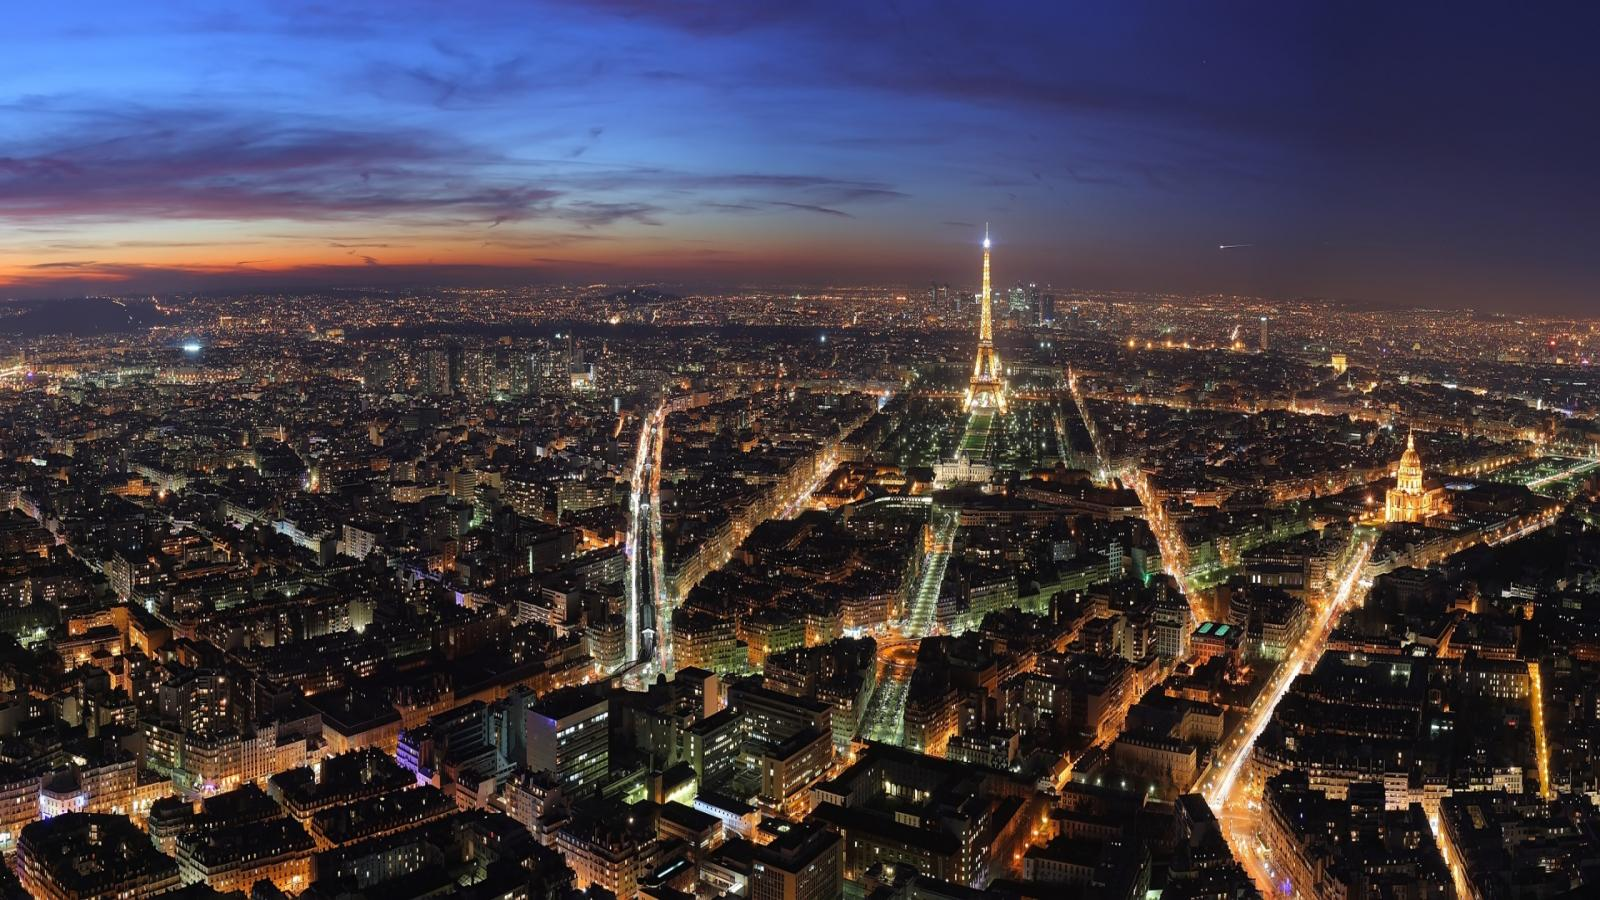 Paris at Night Dual Monitor 1600x900 Wallpapers HD Wallpapers 1600x900